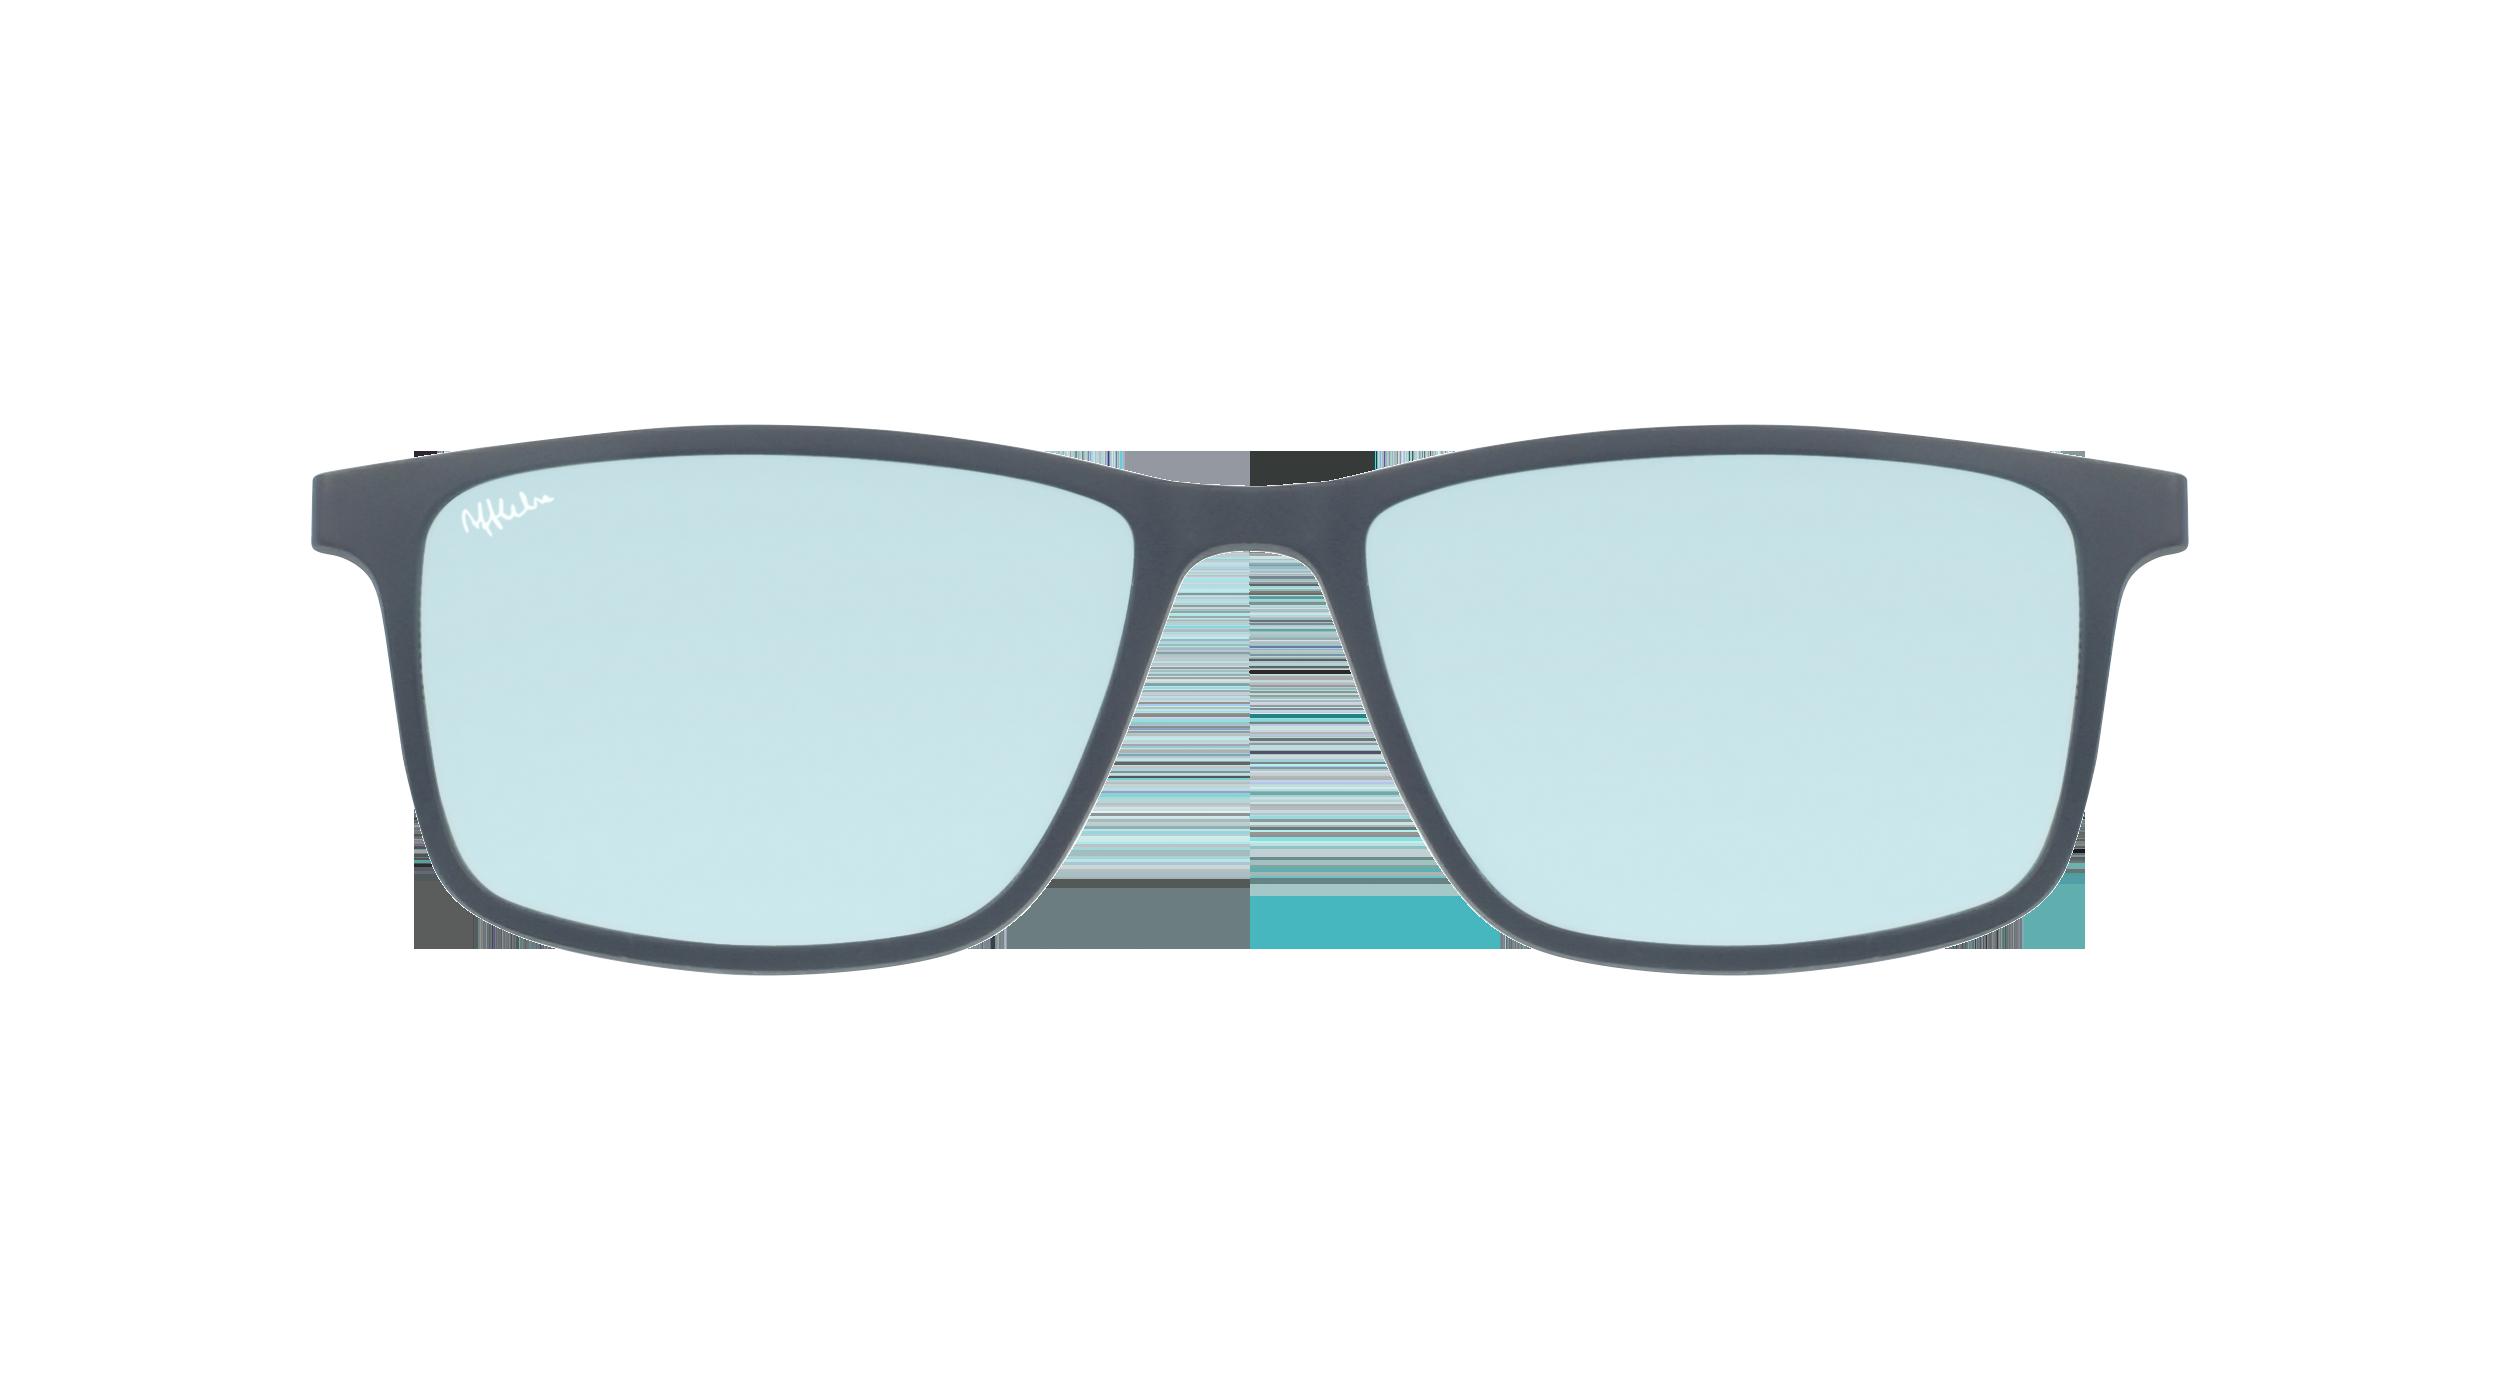 afflelou/france/products/smart_clip/clips_glasses/07630036457016.png